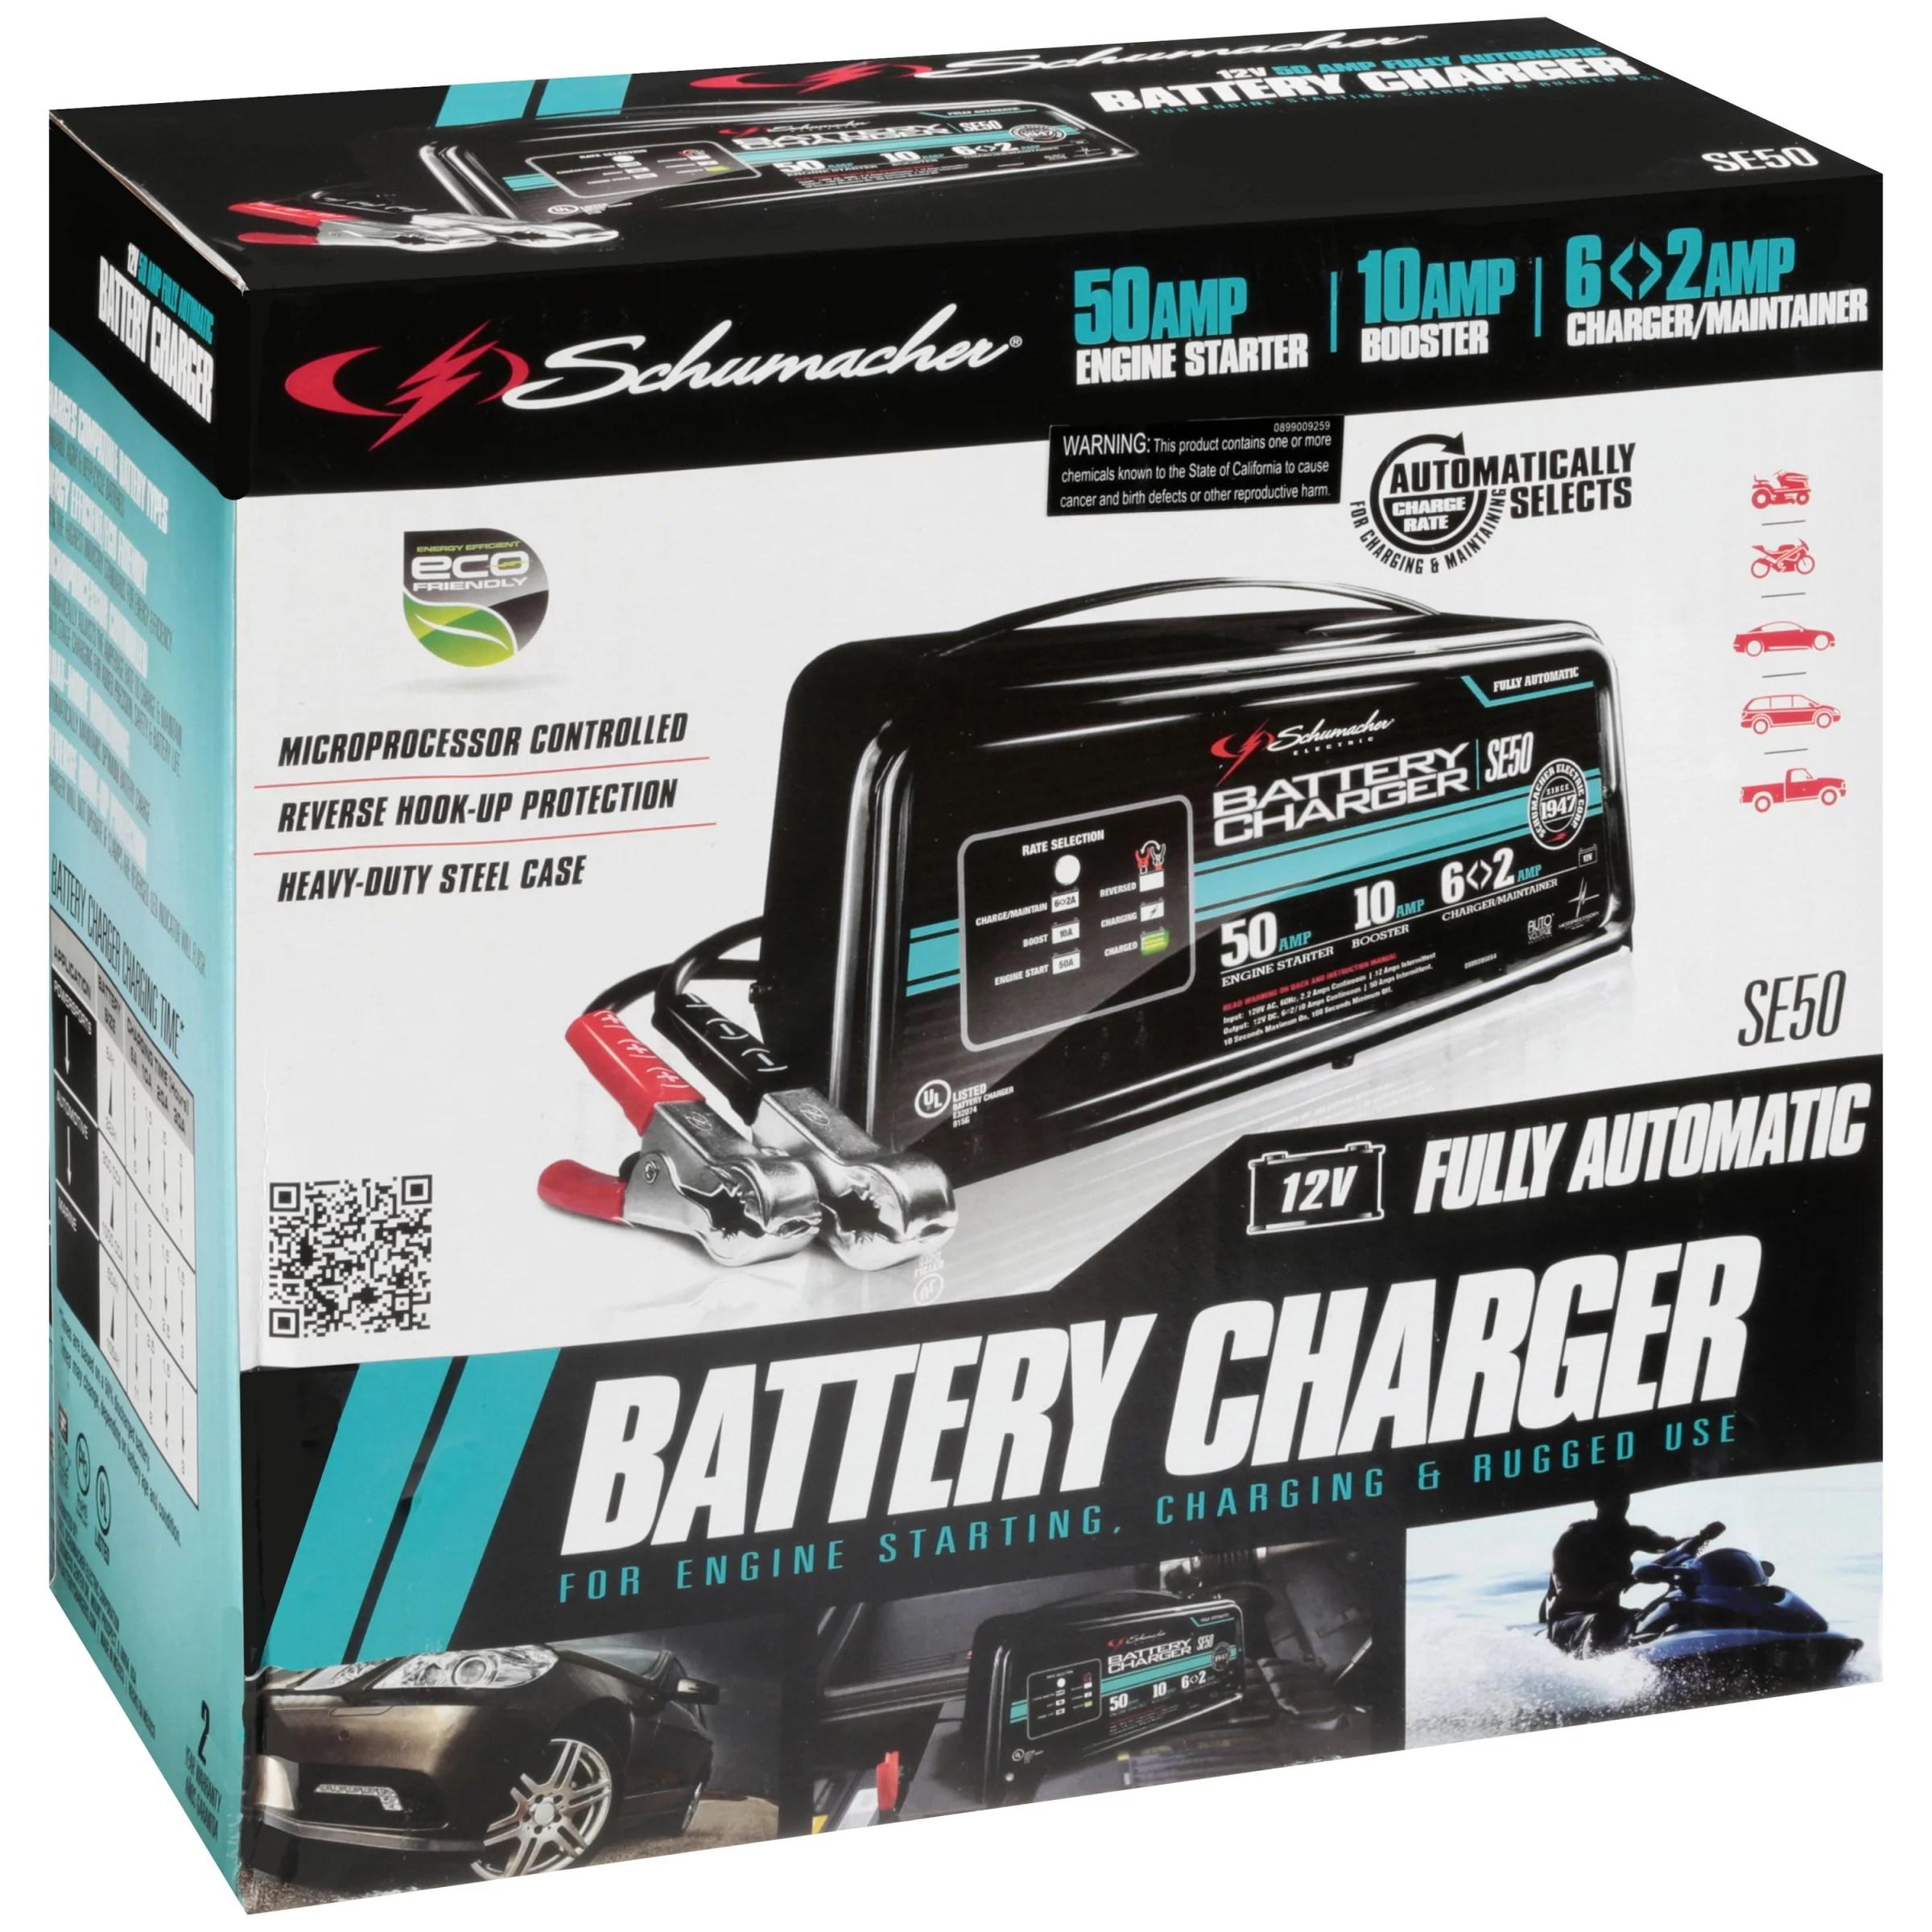 medium resolution of schumacher se50 12v fully automatic battery charger walmart comschumacher se50 12v fully automatic battery